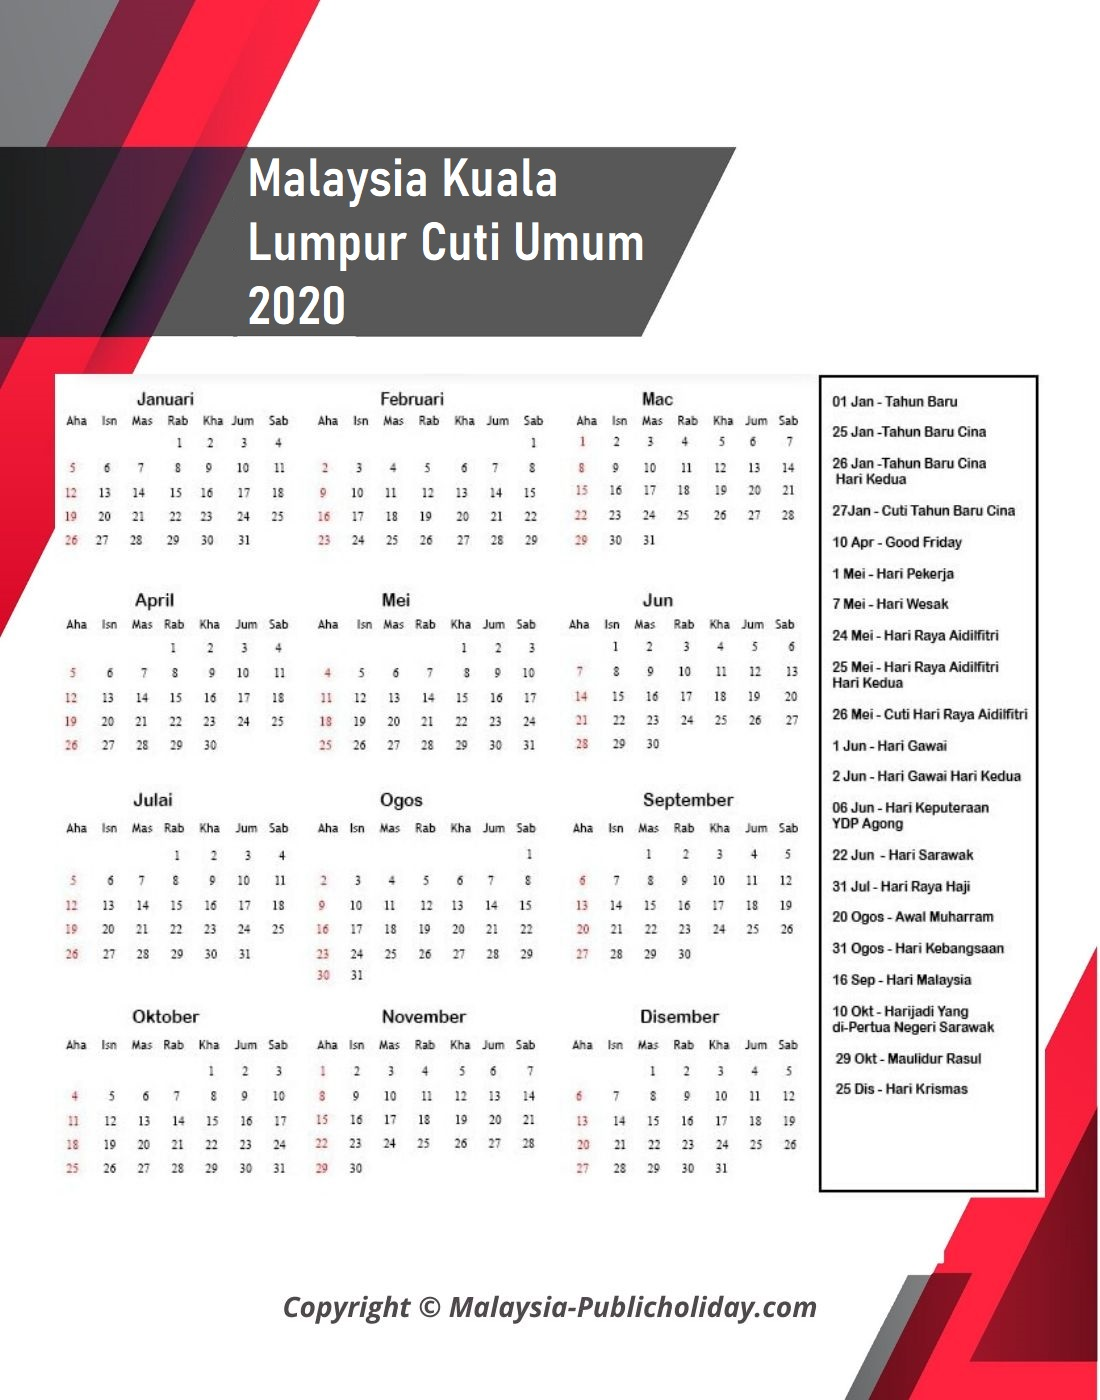 2020 Kalendar Kuala Lumpur